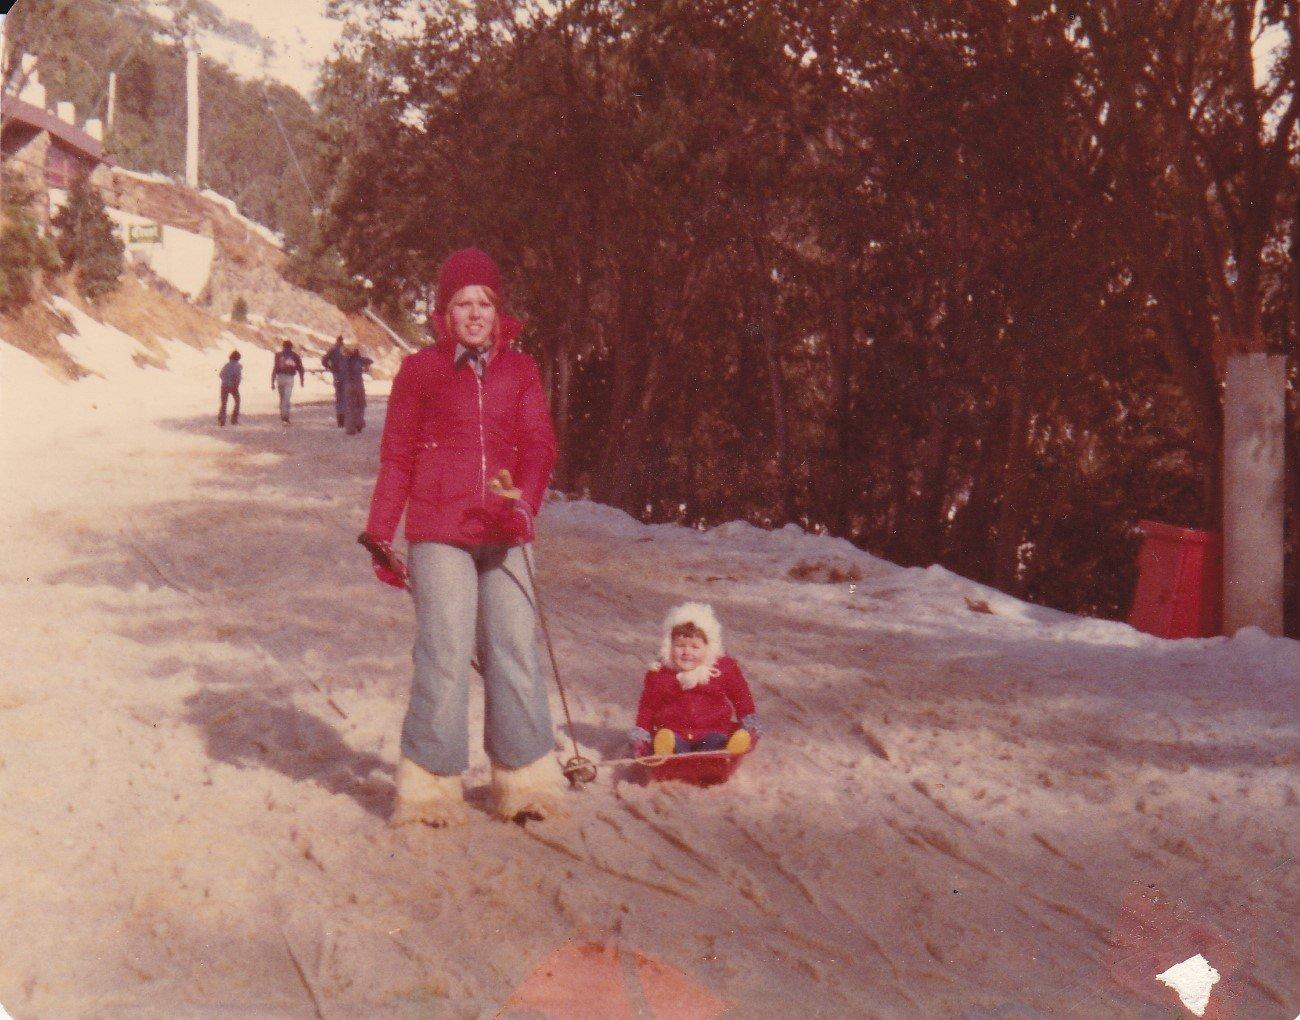 Myself and Kylie 1977 - love my boots!! .jpg